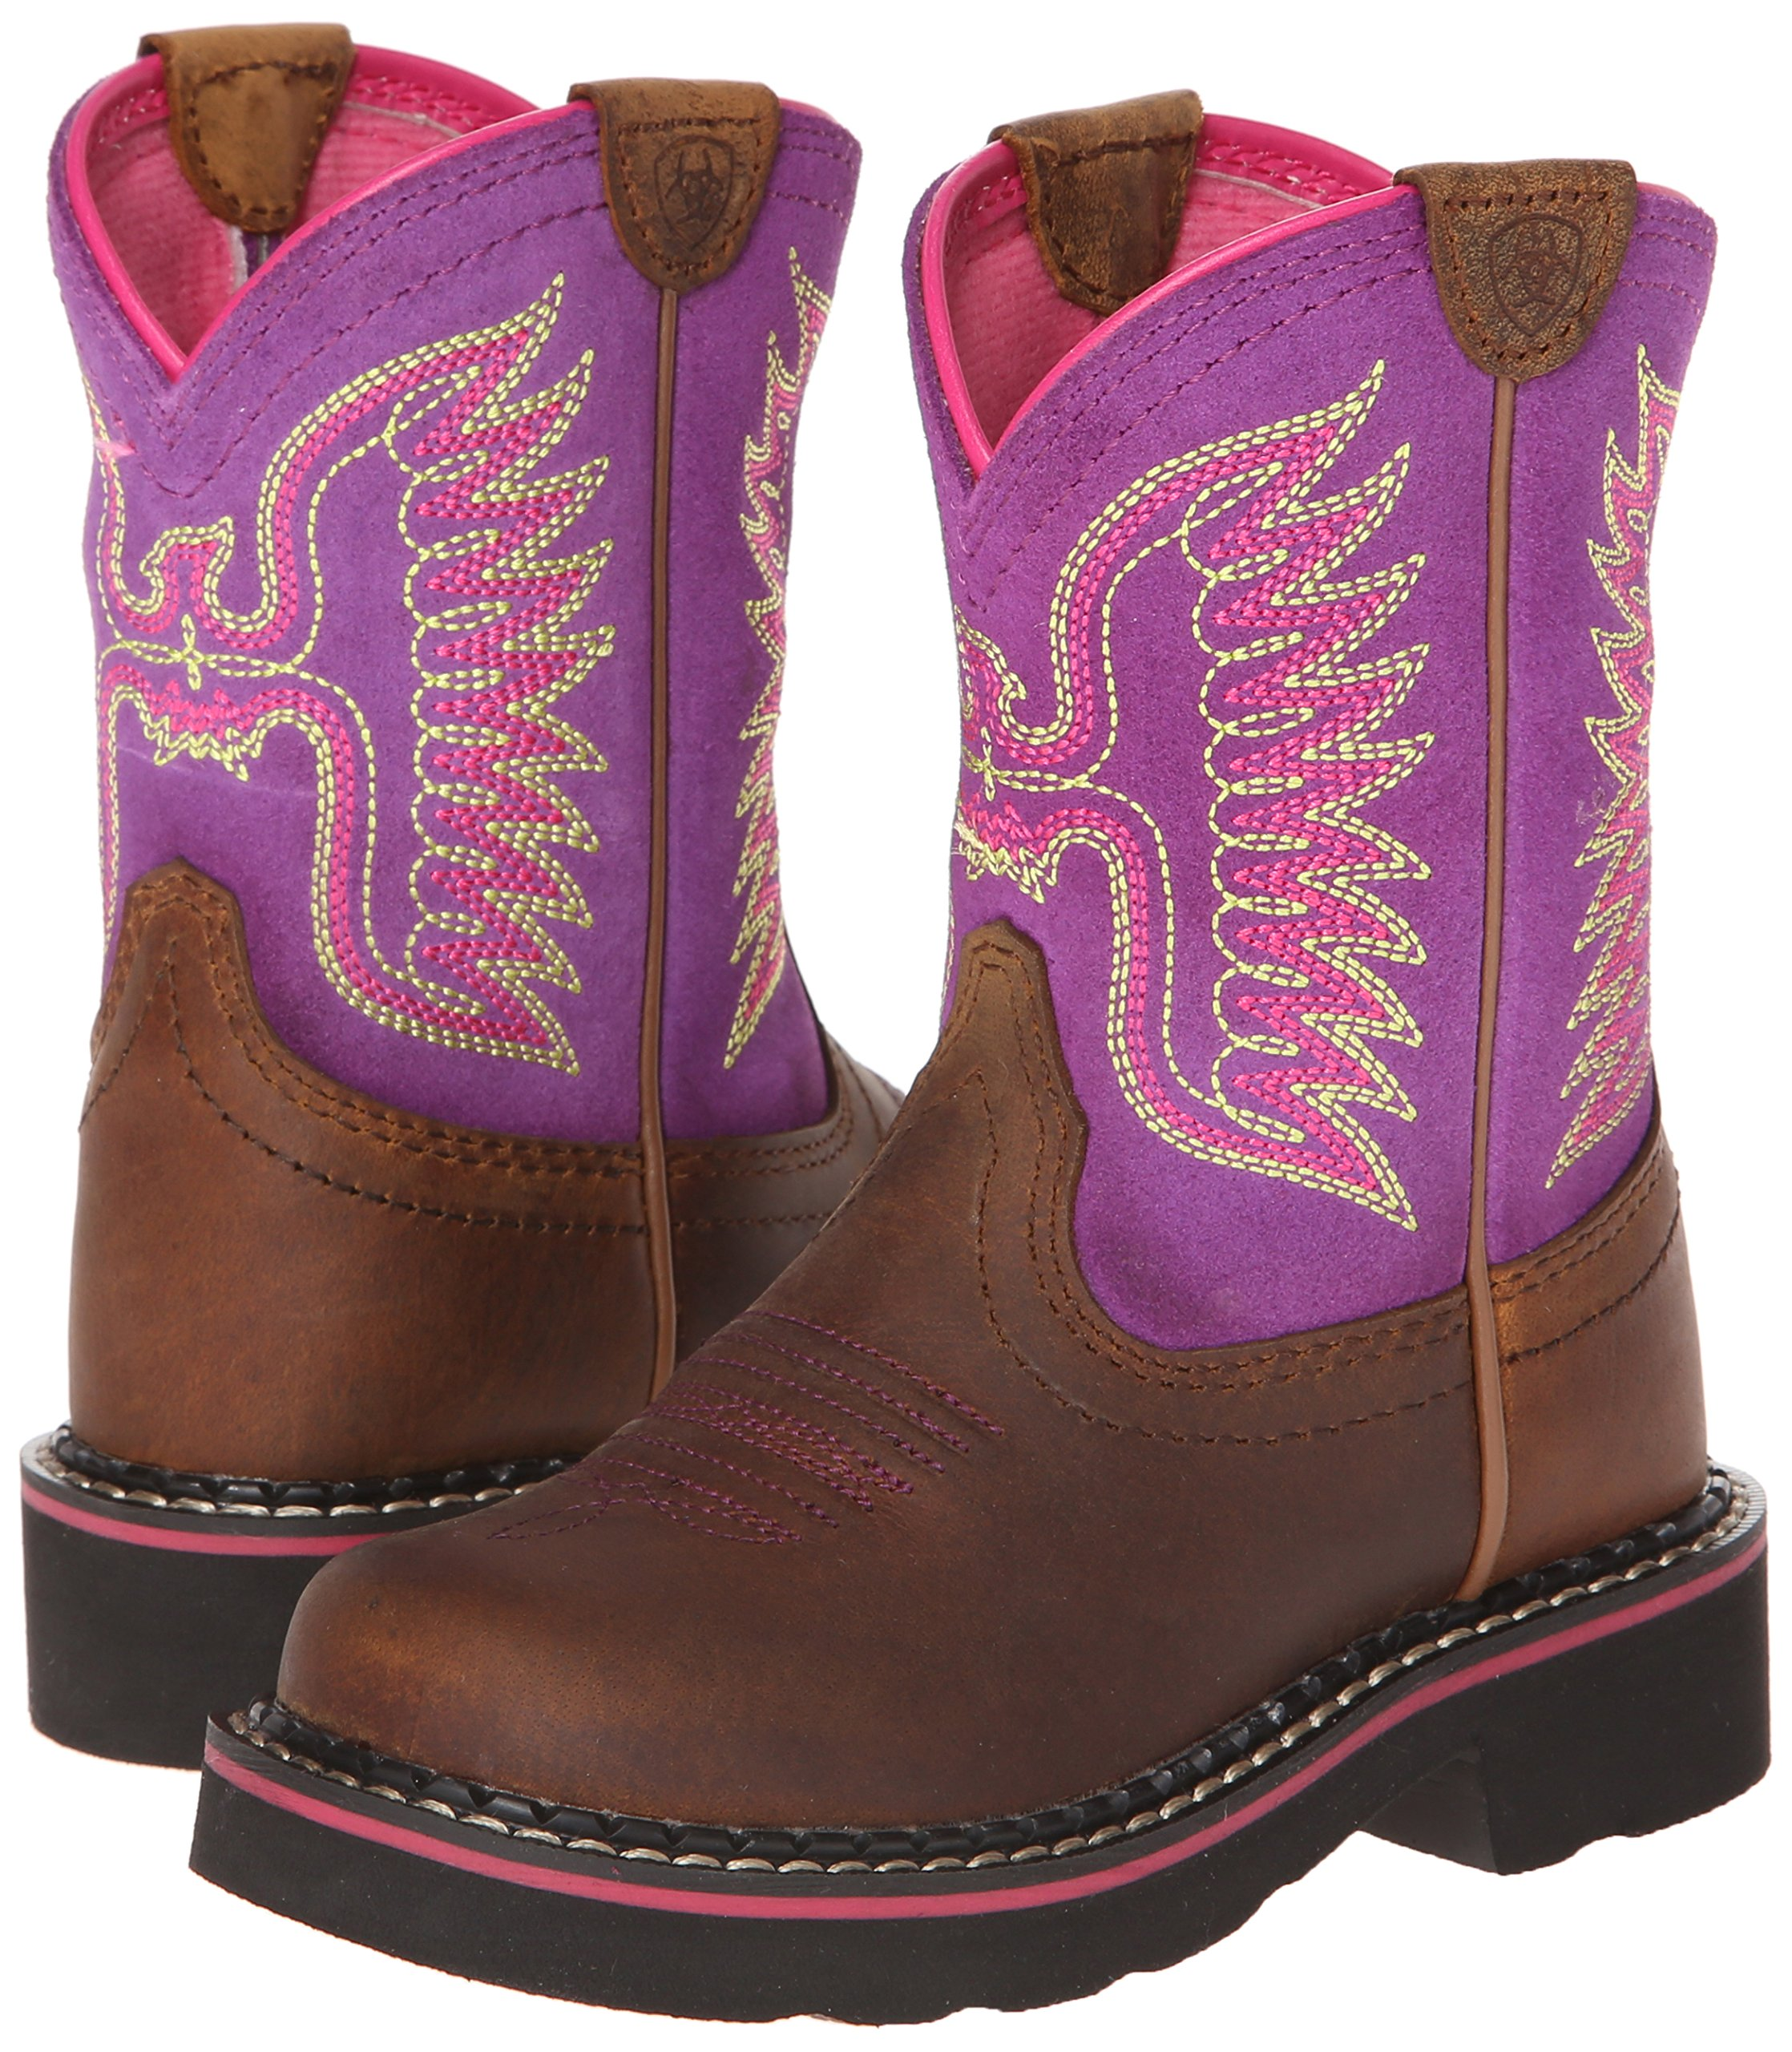 Kids' Fatbaby Thunderbird Western Cowboy Boot, Powder Brown/Amethyst, 12.5 M US Little Kid by ARIAT (Image #6)